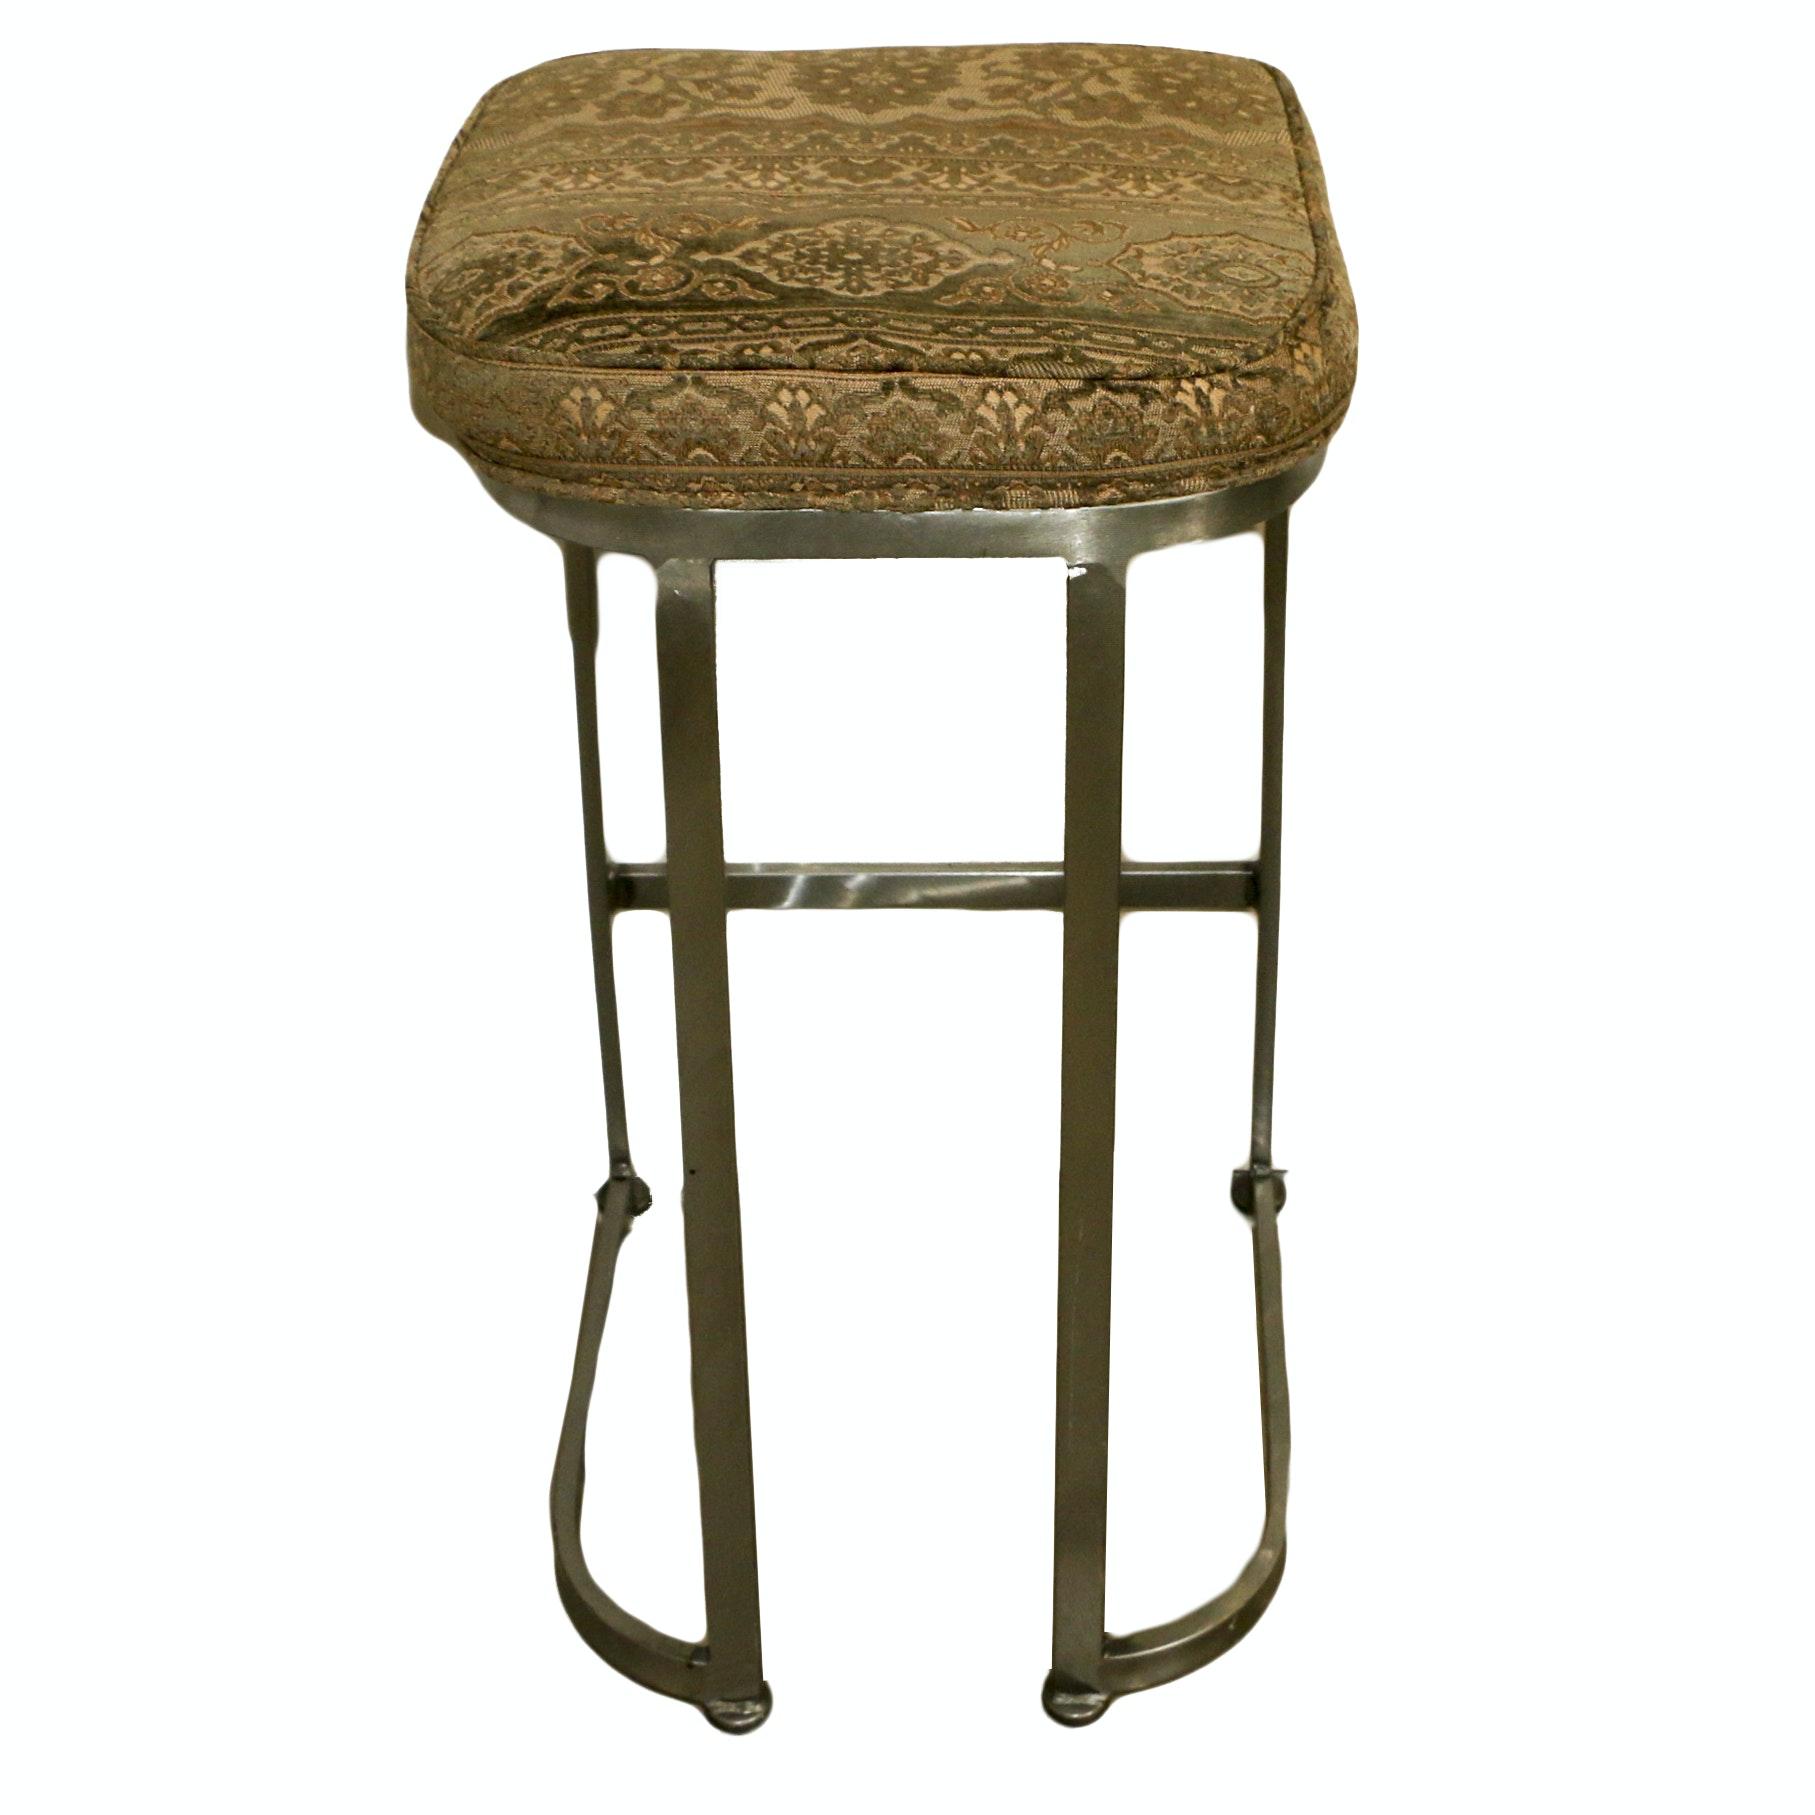 Upholstered Backless Metal Stool, 21st Century